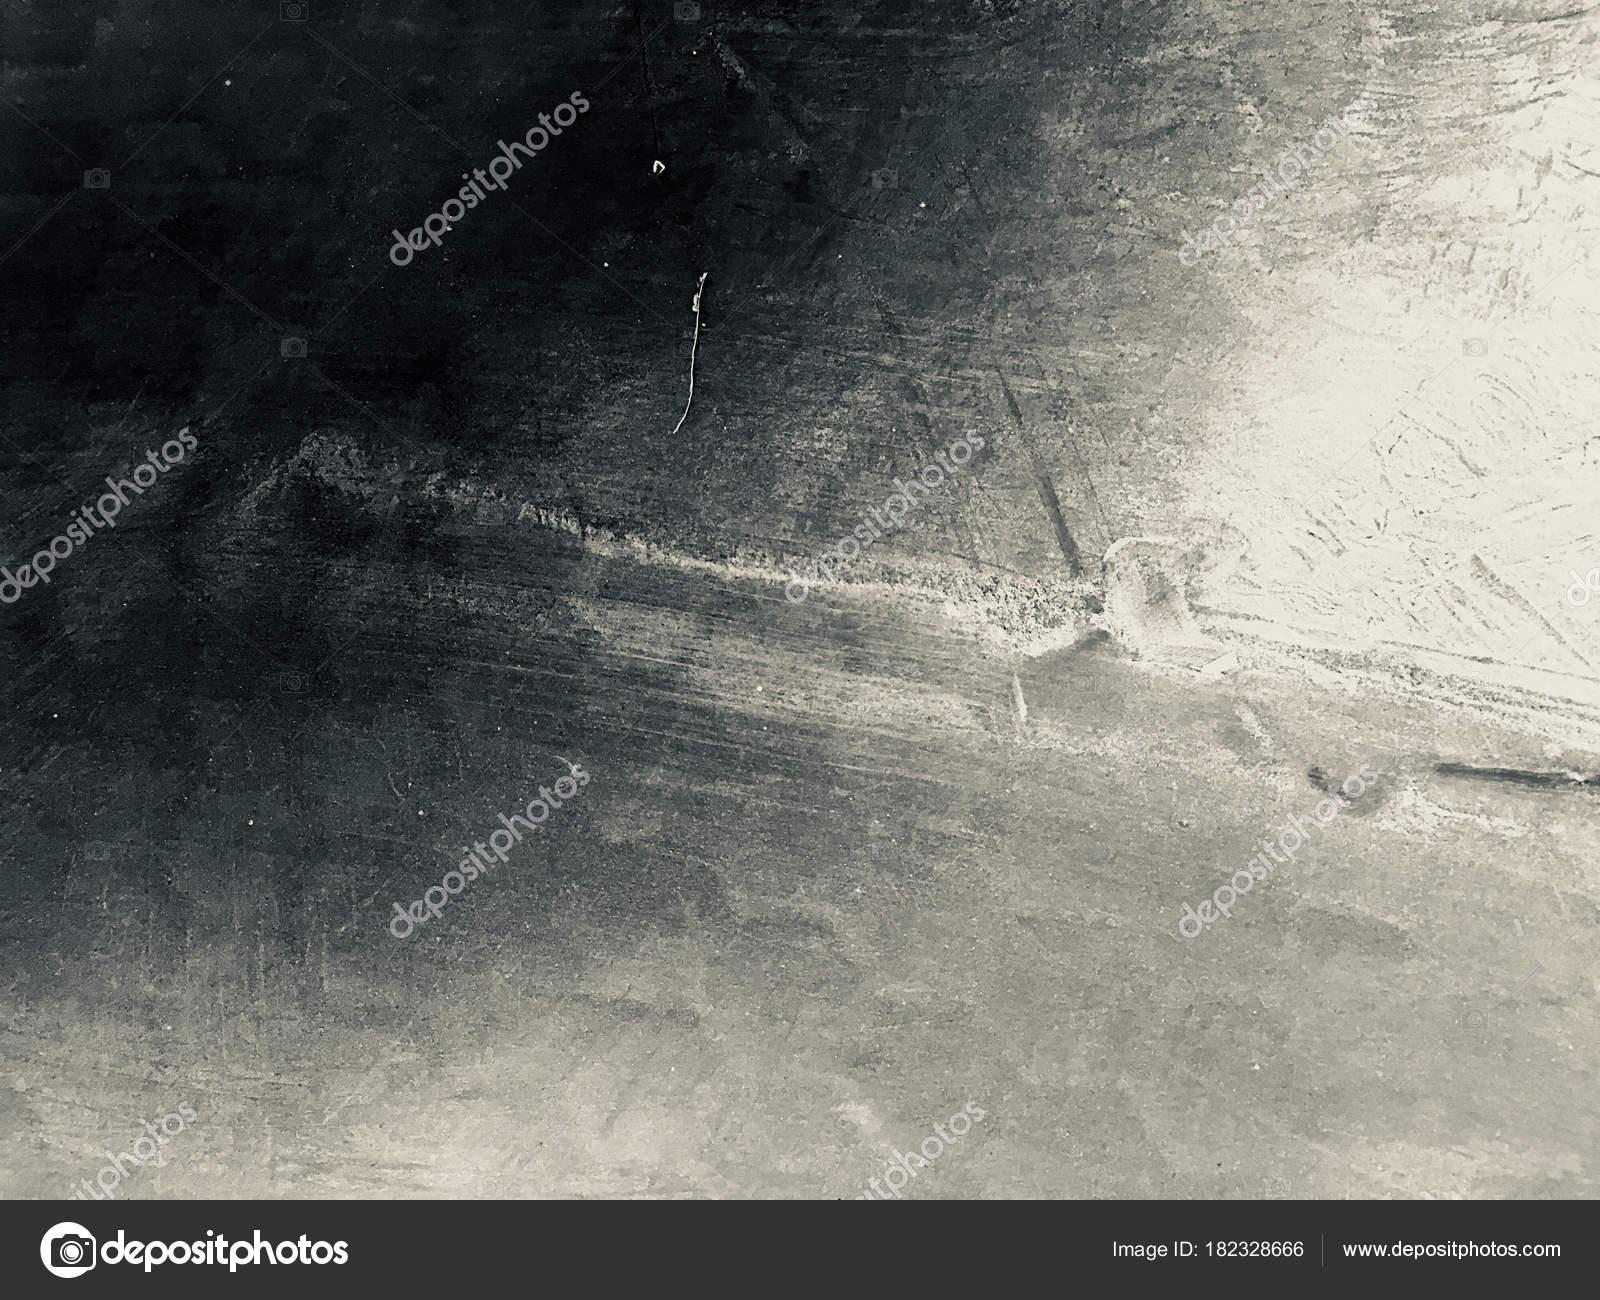 Putz Wand Textur Mit Sechseckigen Muster Stockfoto C Designpraxis